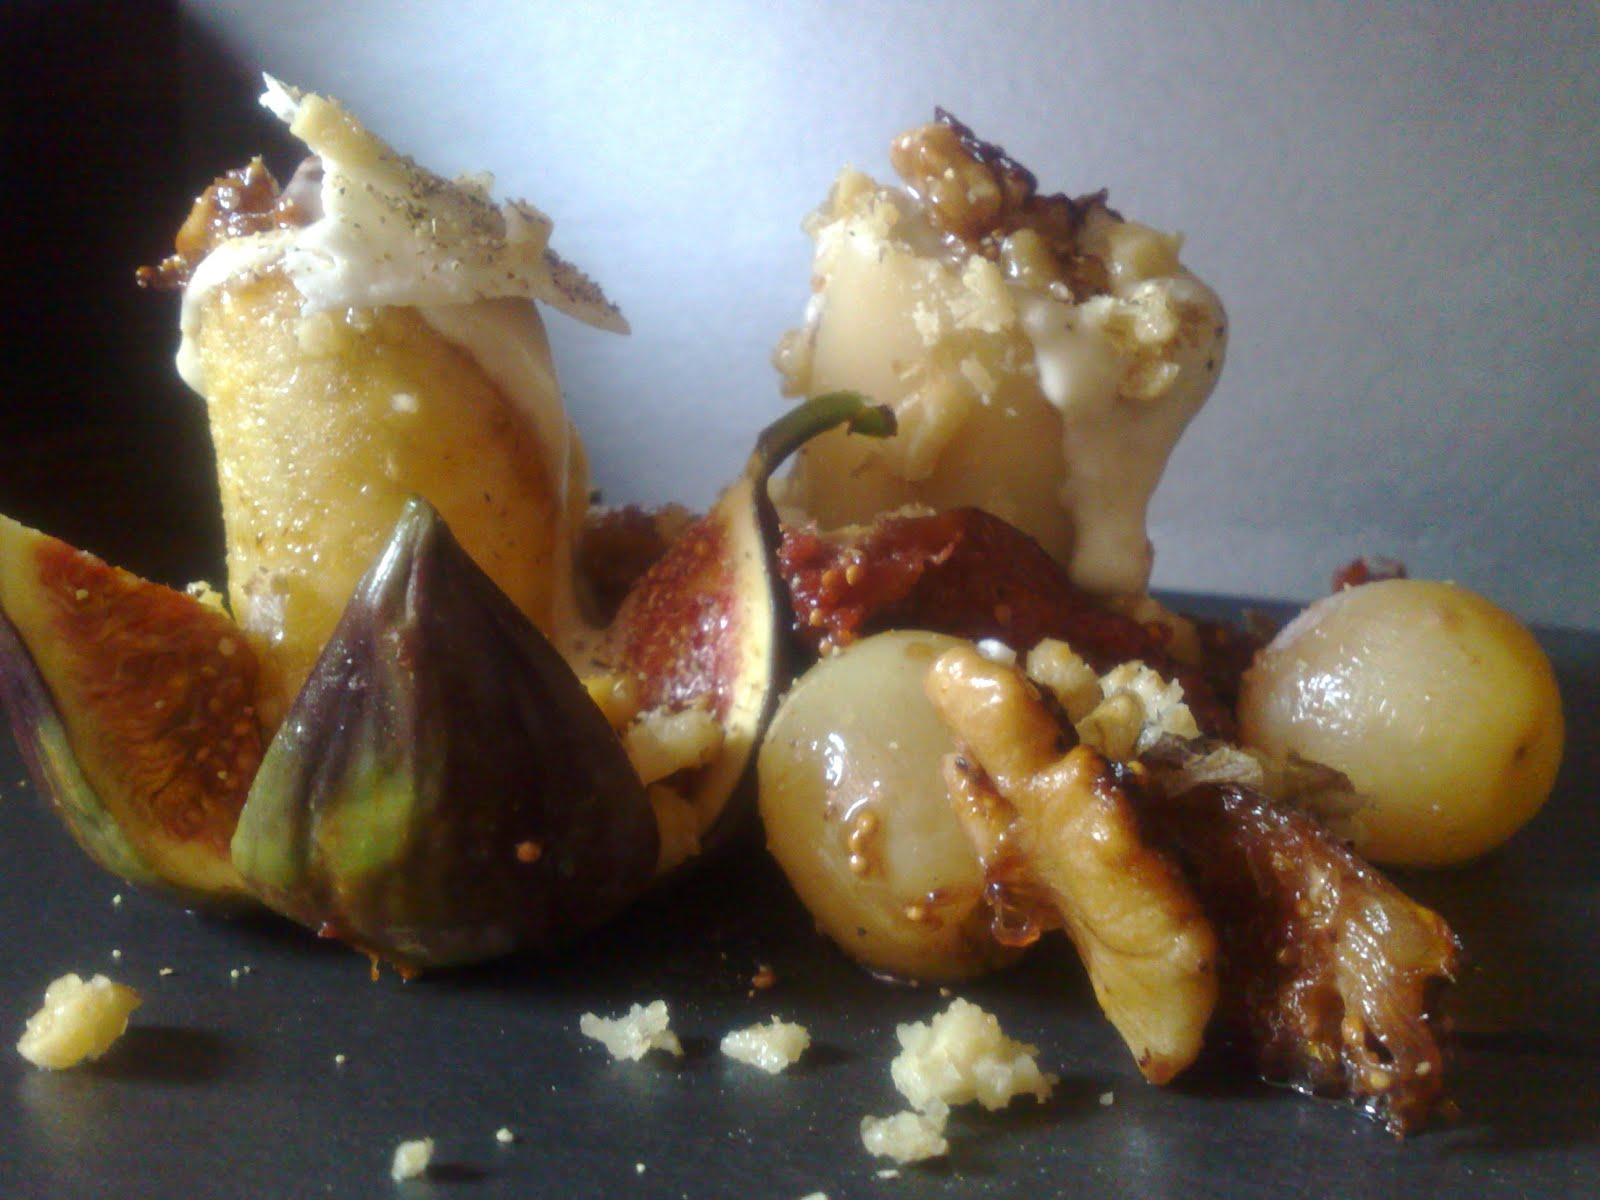 Pacchero, Montebore, fichi ed uva